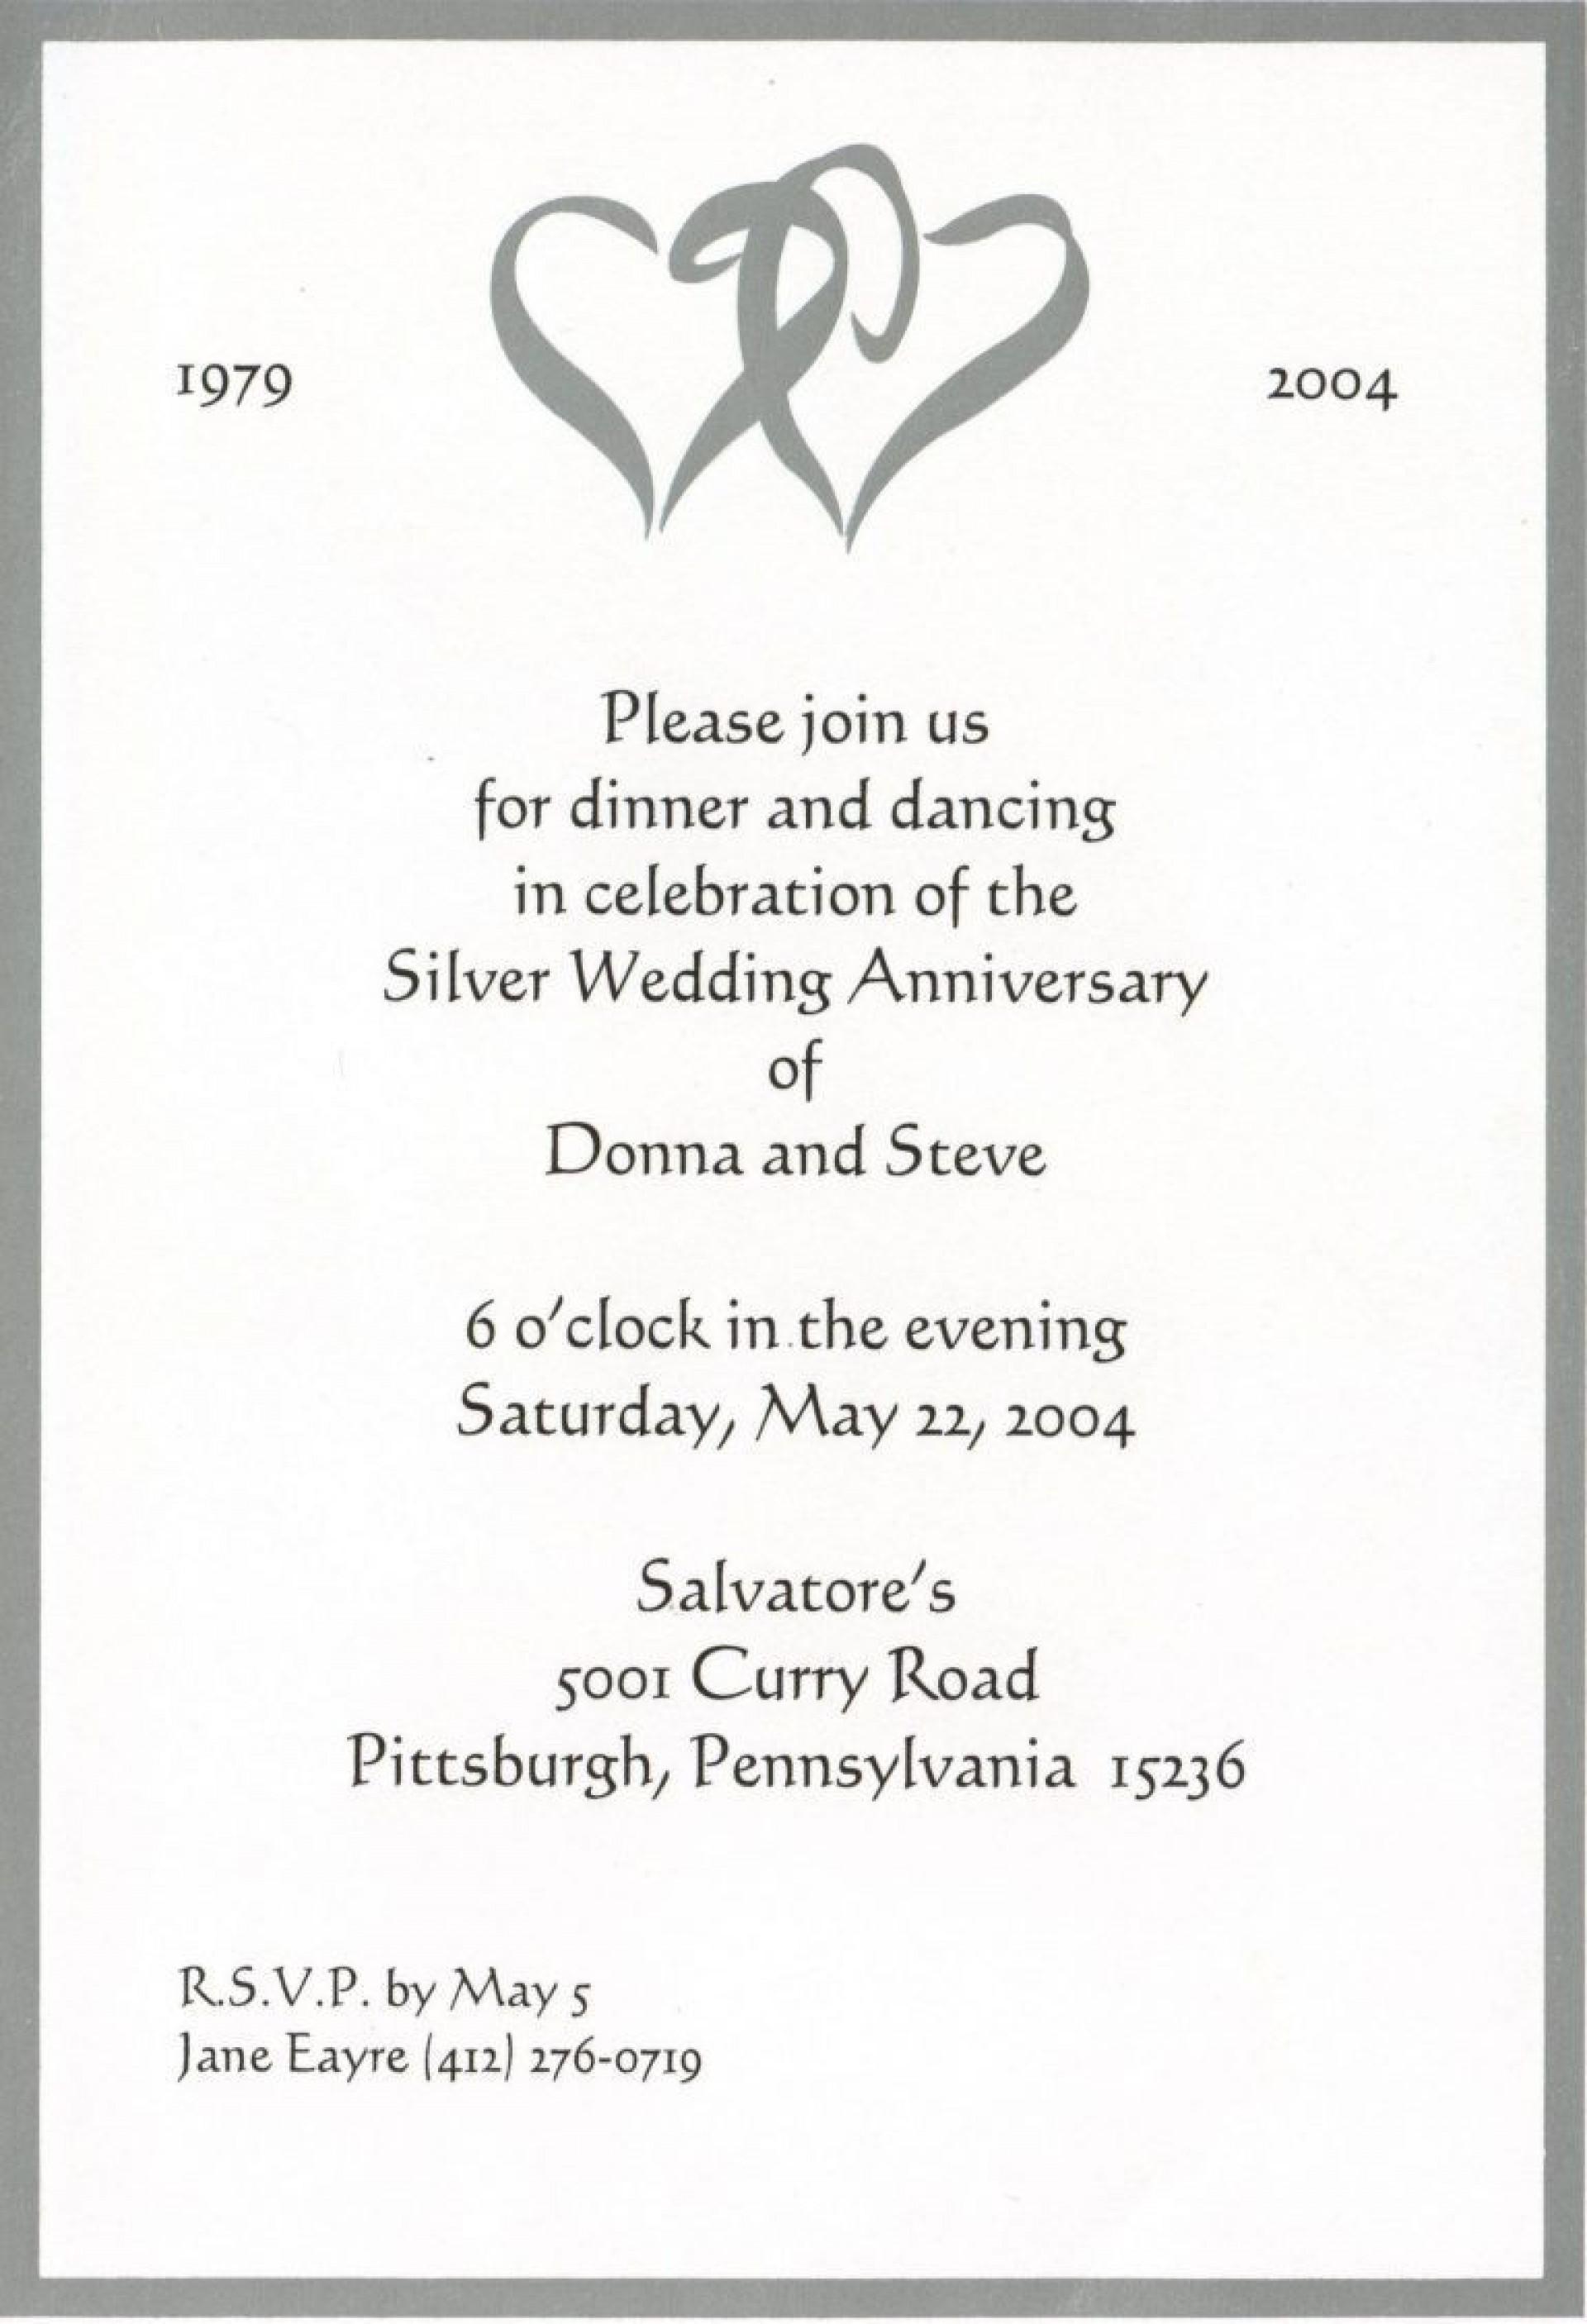 000 Incredible 50th Wedding Anniversary Invitation Card Sample High Def  Wording1920